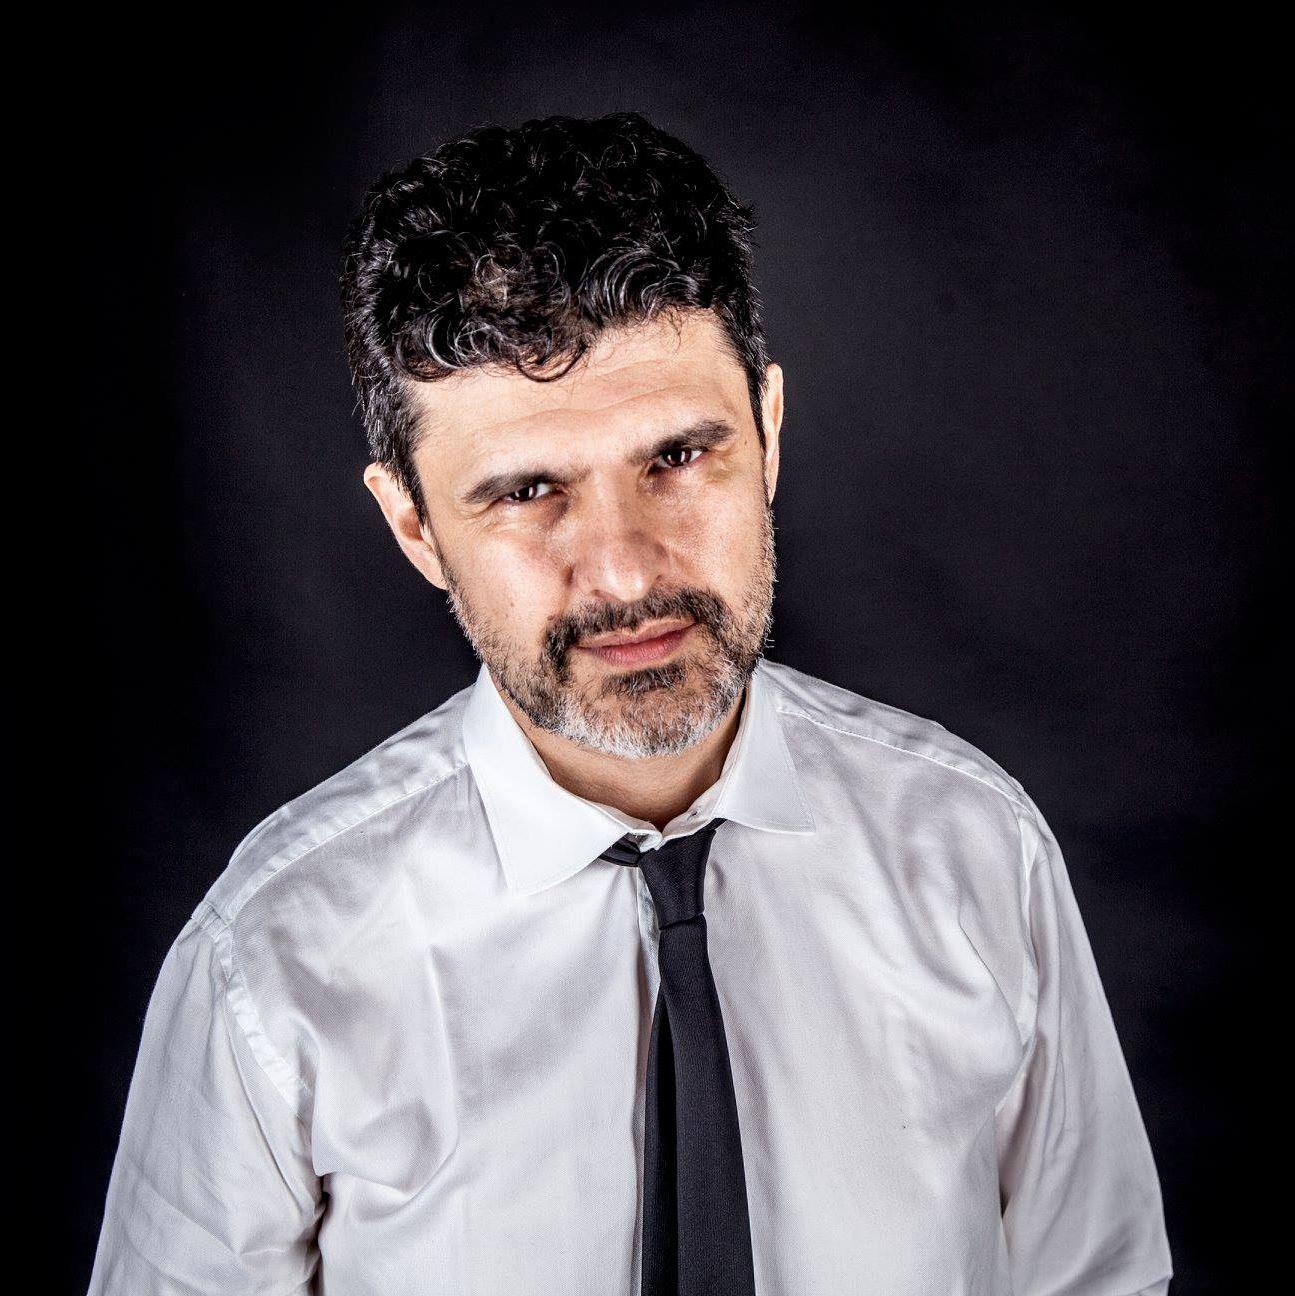 An image portraying Luca Bottura